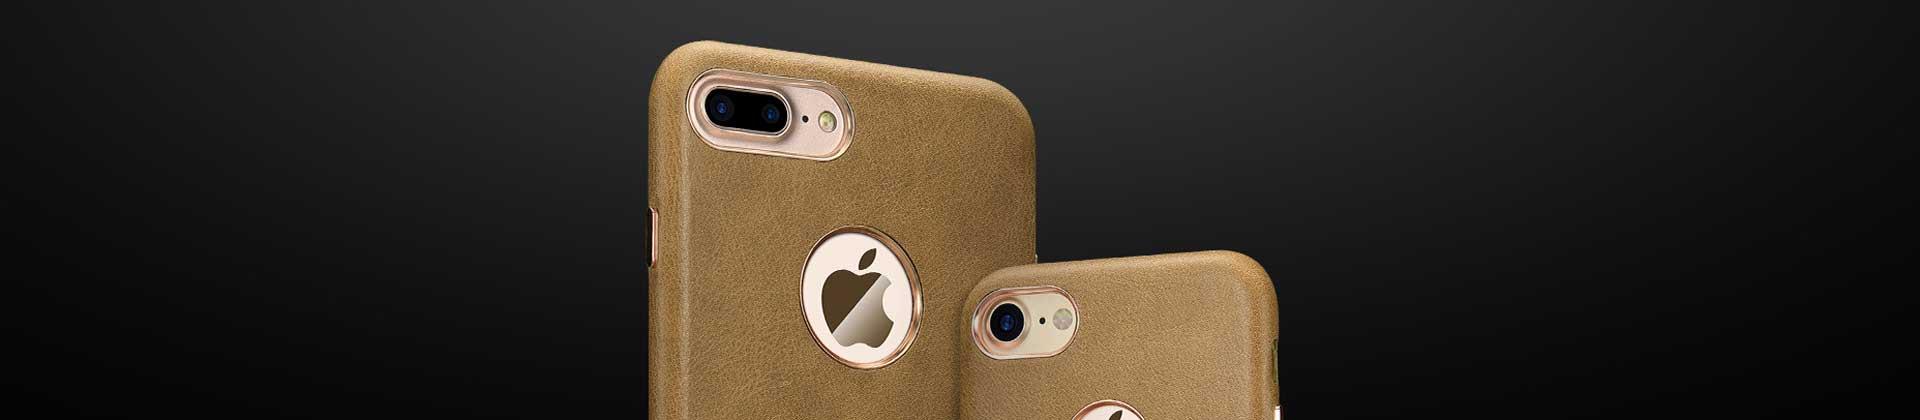 iPhone 8 Plus Étui Cuir